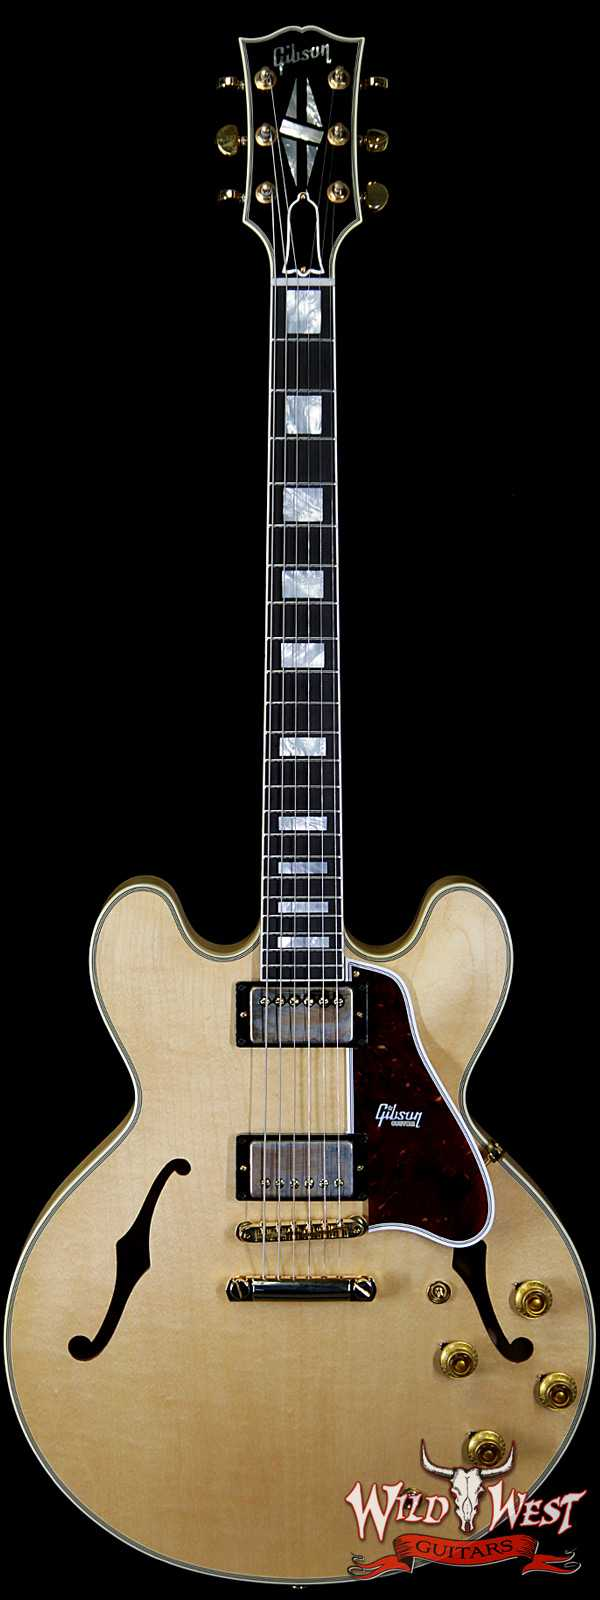 2020 NAMM Gibson Custom Shop 1959 ES-355 Reissue VOS Stop Bar Ebony Fingerboard Vintage Natural